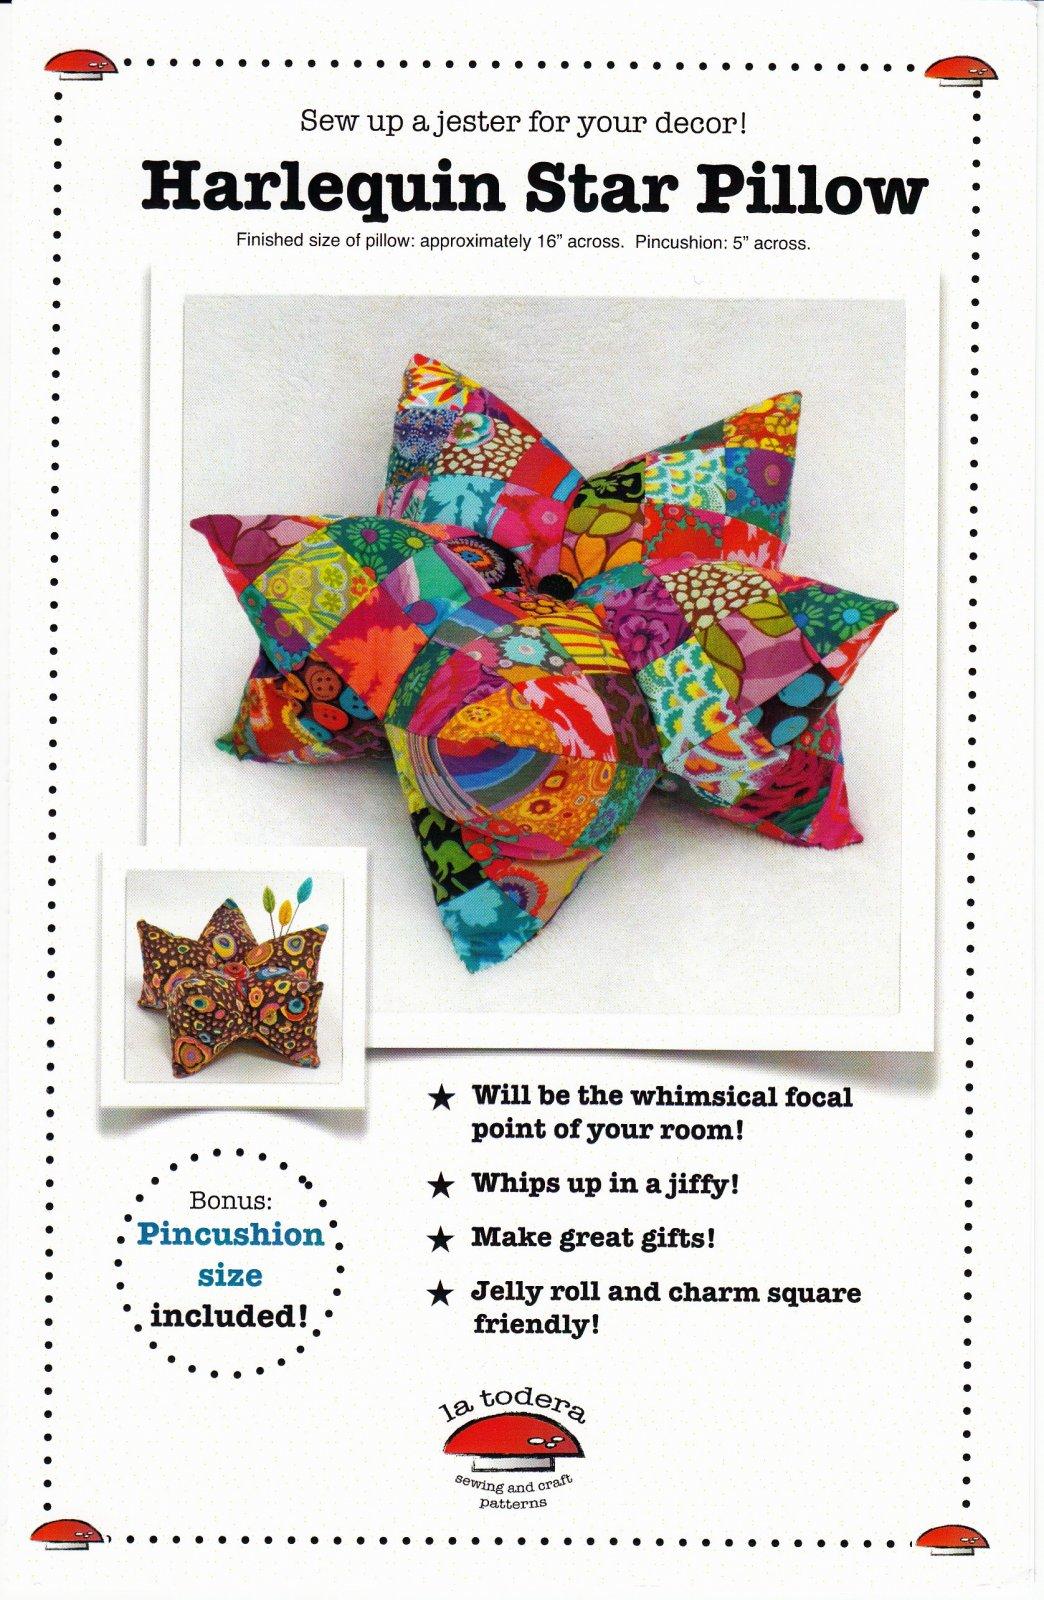 Harlequin Star Pillow & Pincushion